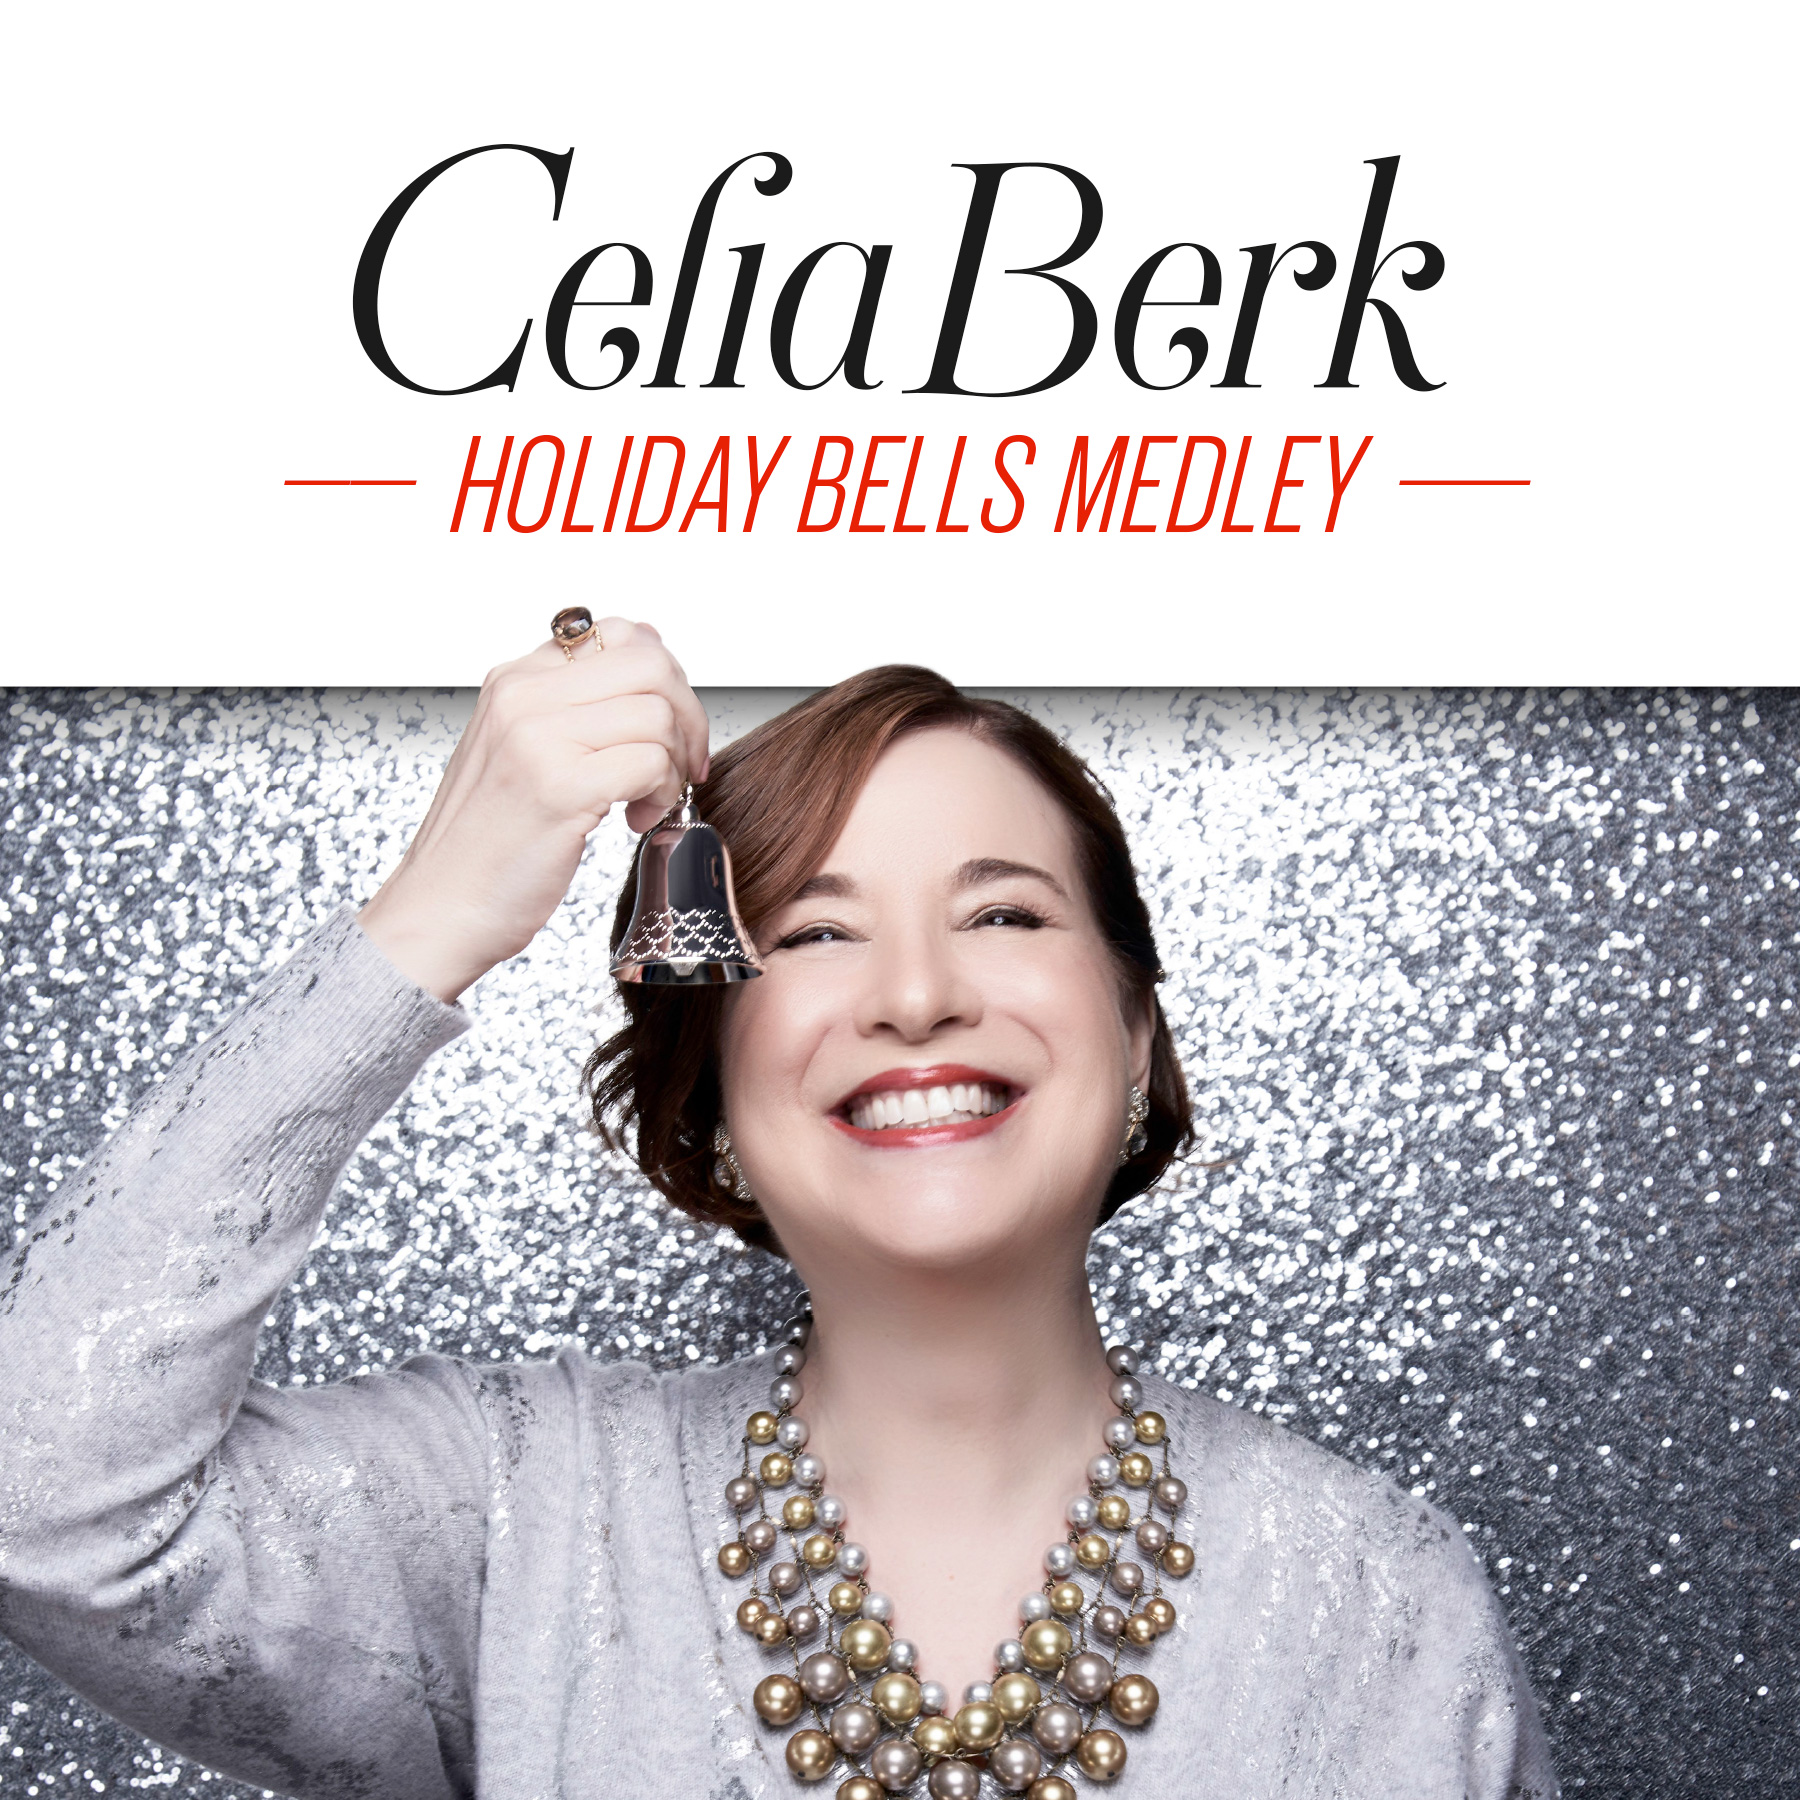 Celia Berk's Holiday Bells Medley - Photo by Helane Blumfield